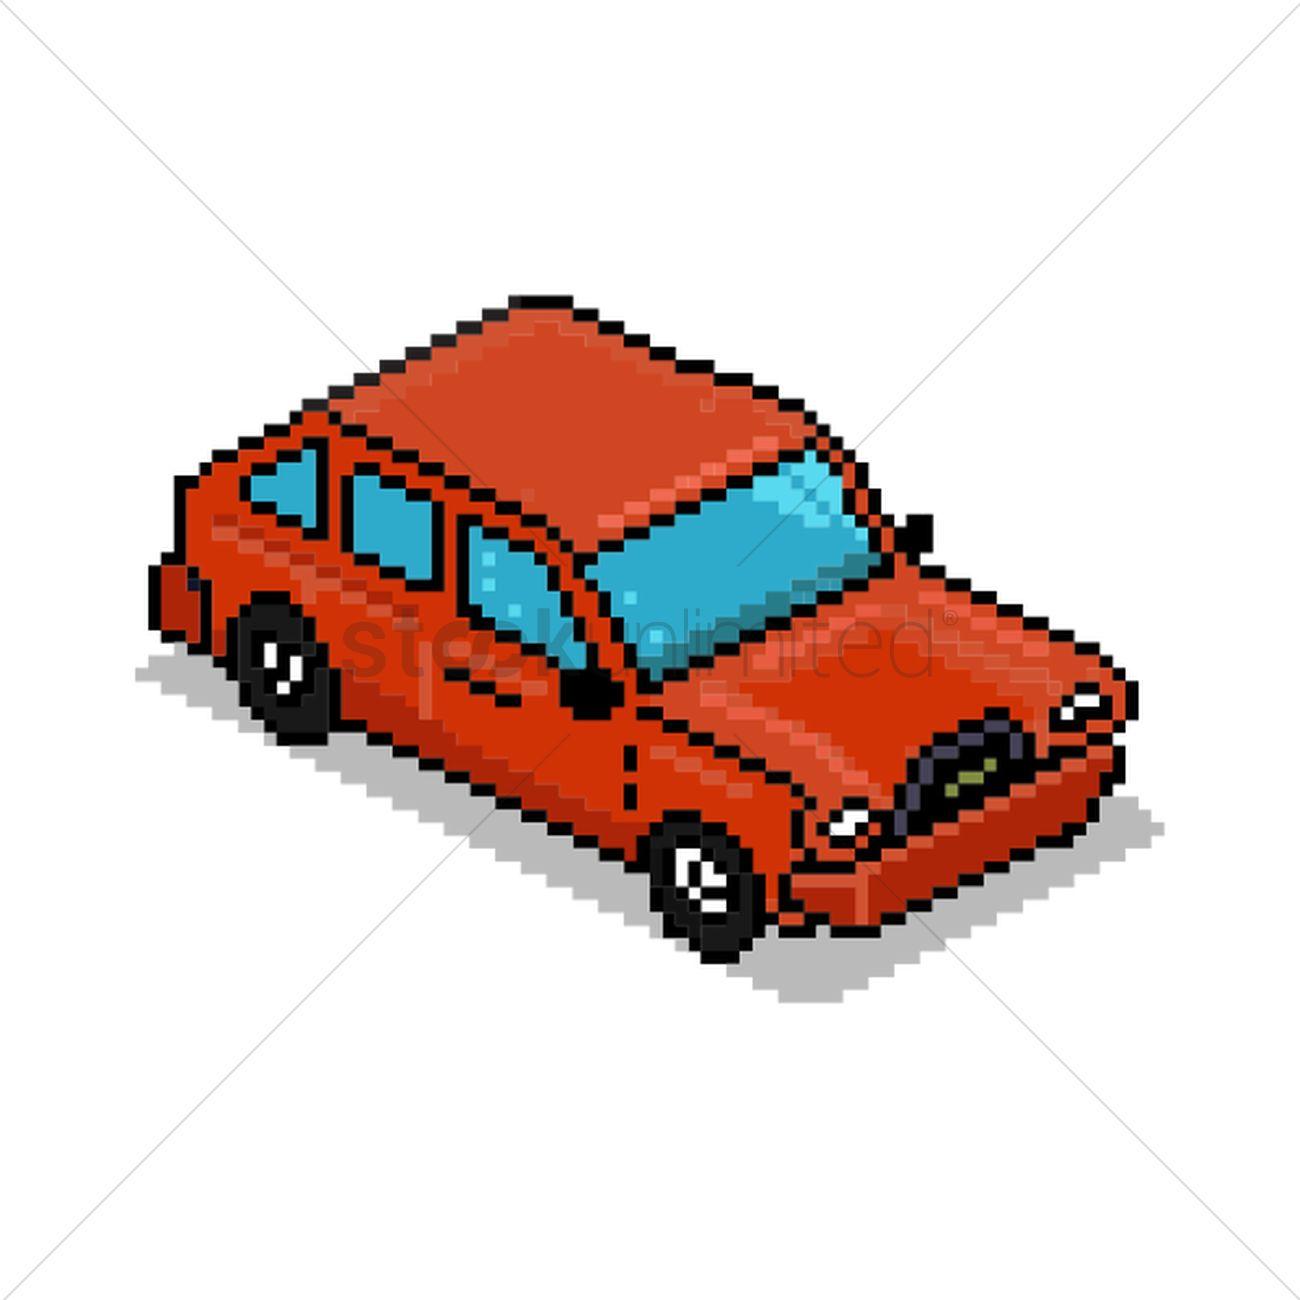 Pixel Art Car Vector Image 1959075 Stockunlimited